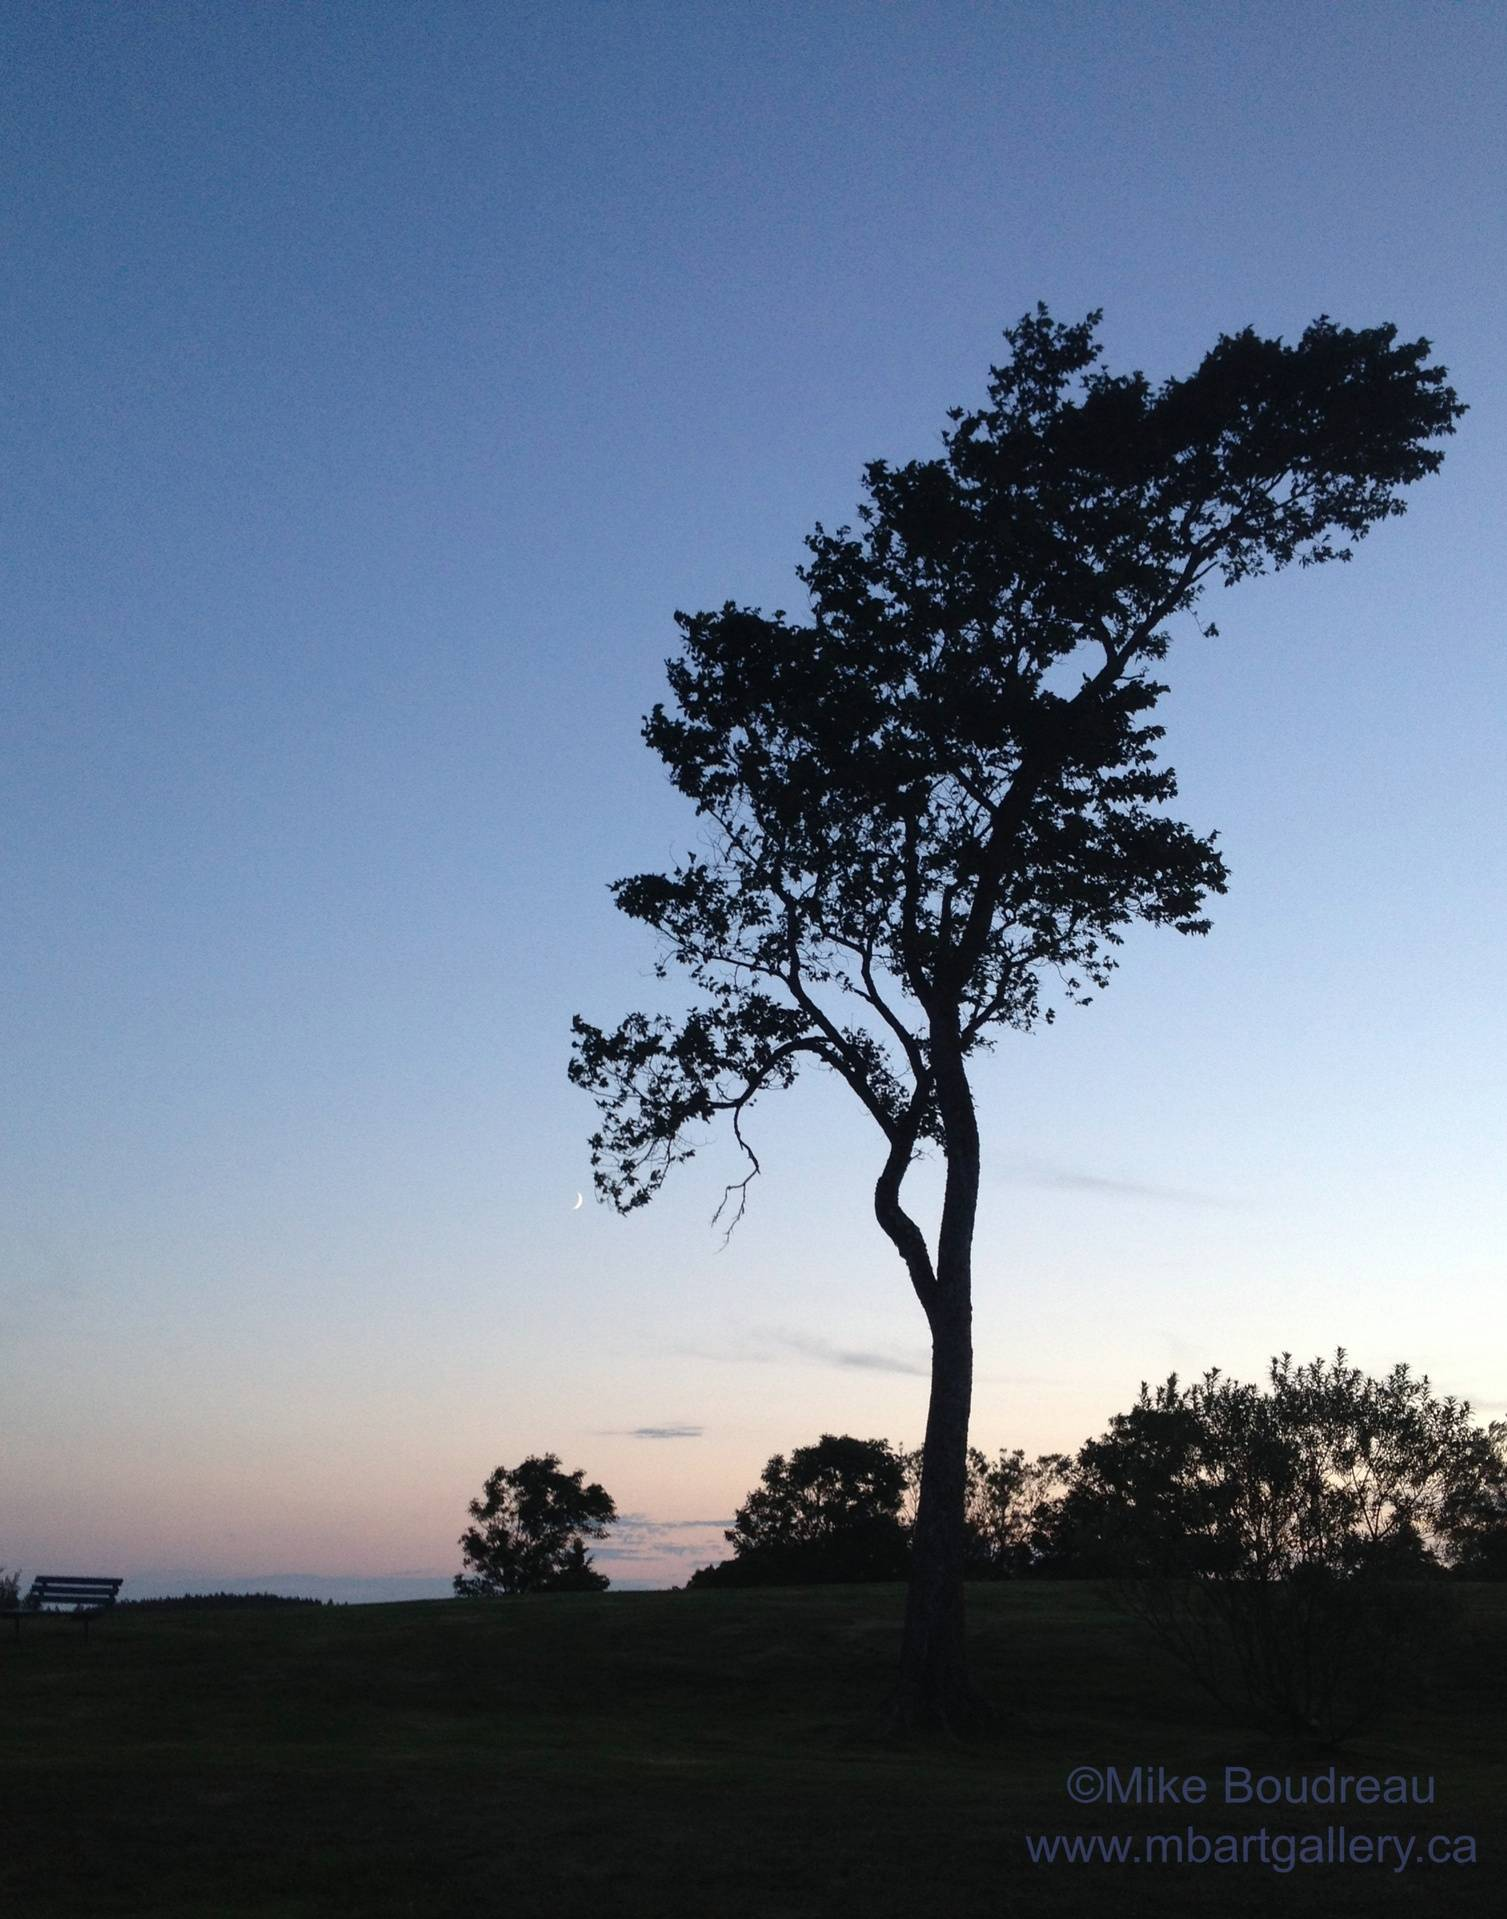 Sunset Seaside Park, Saint John NB